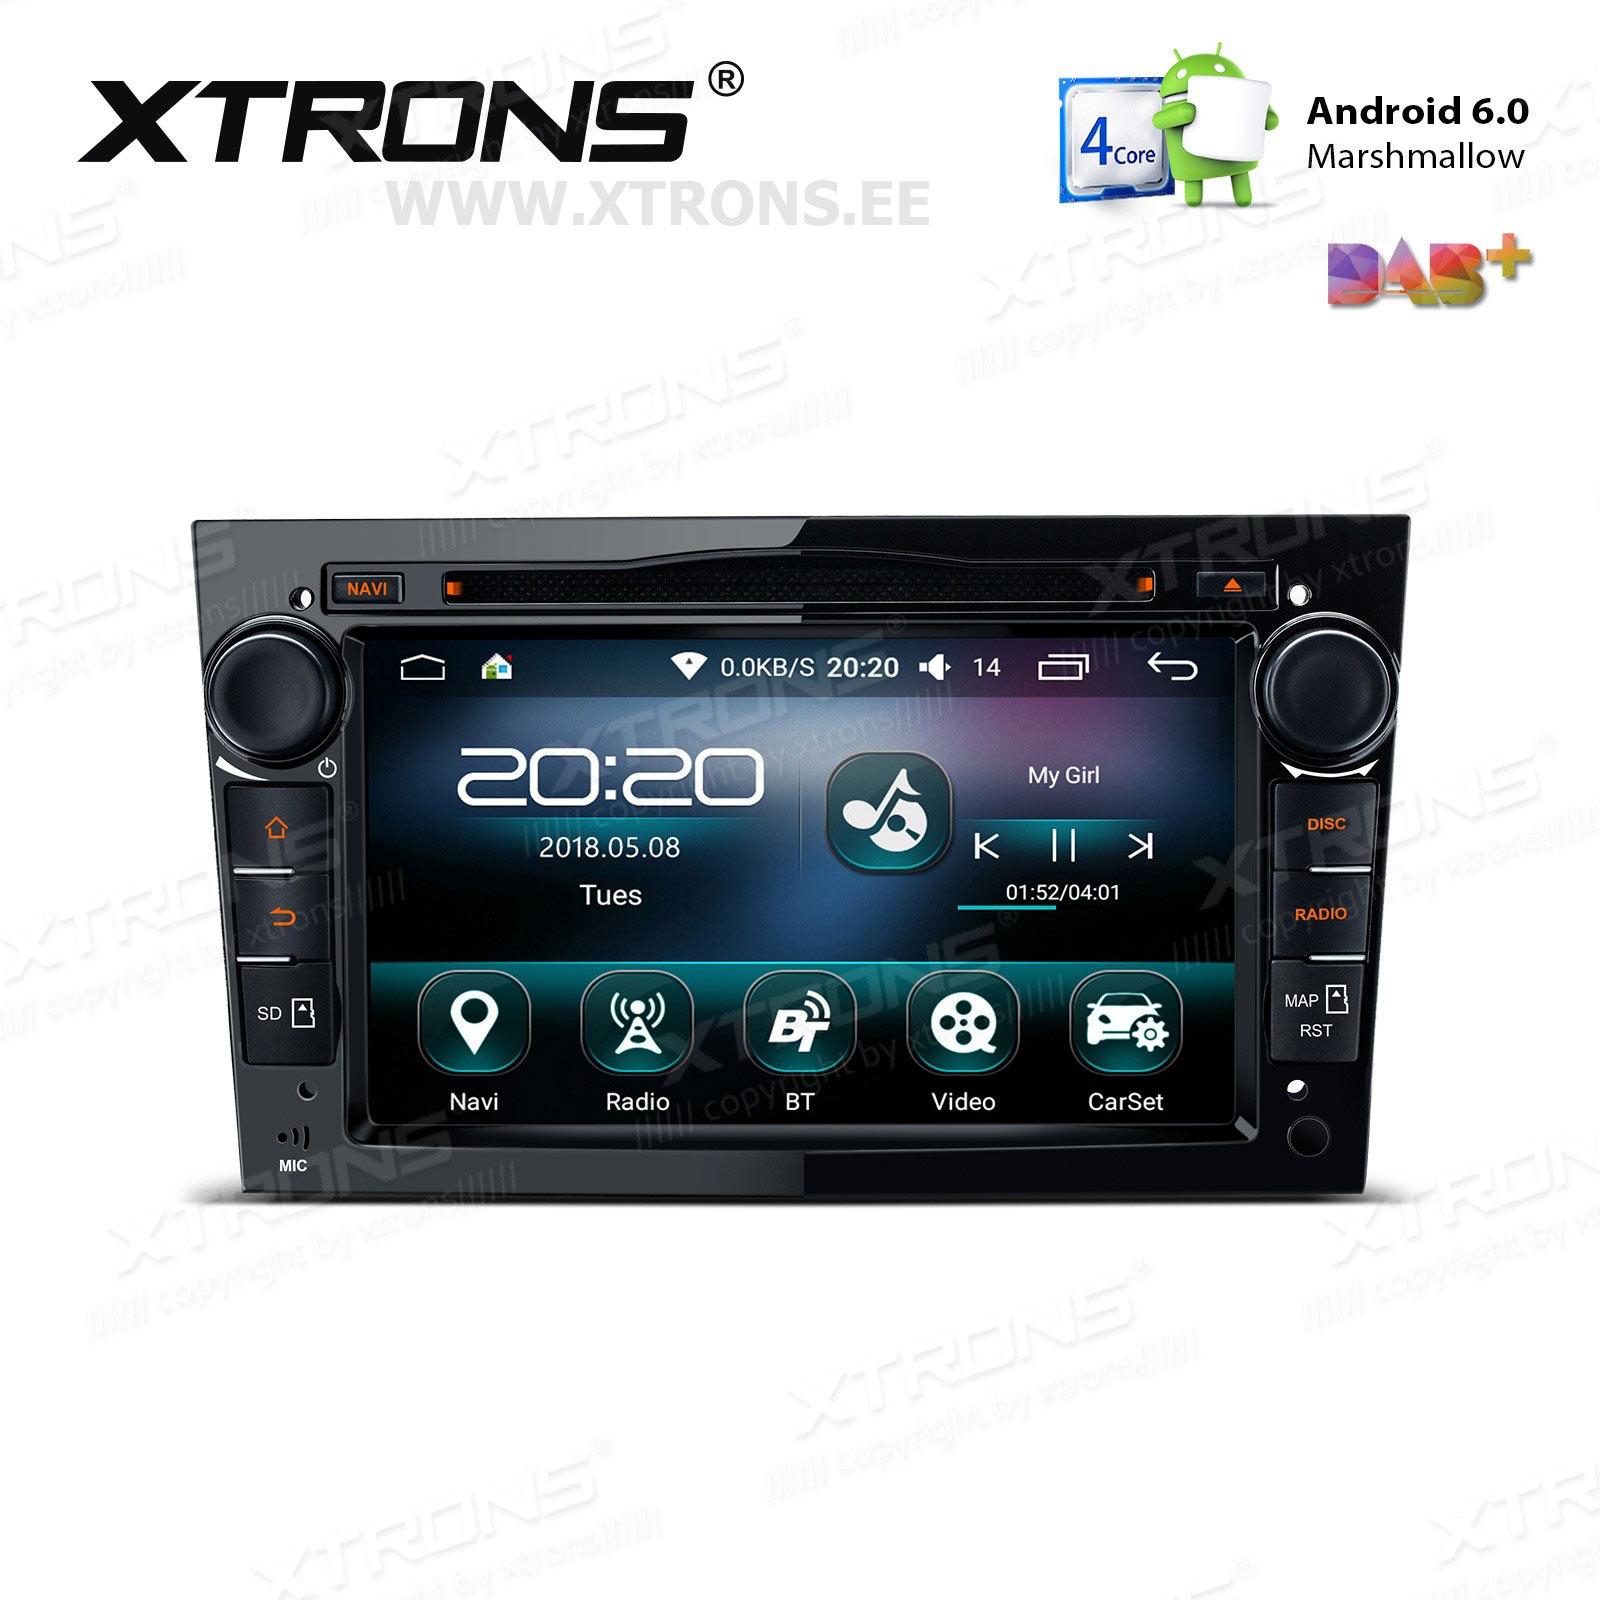 XTRONS PS76OLO-B